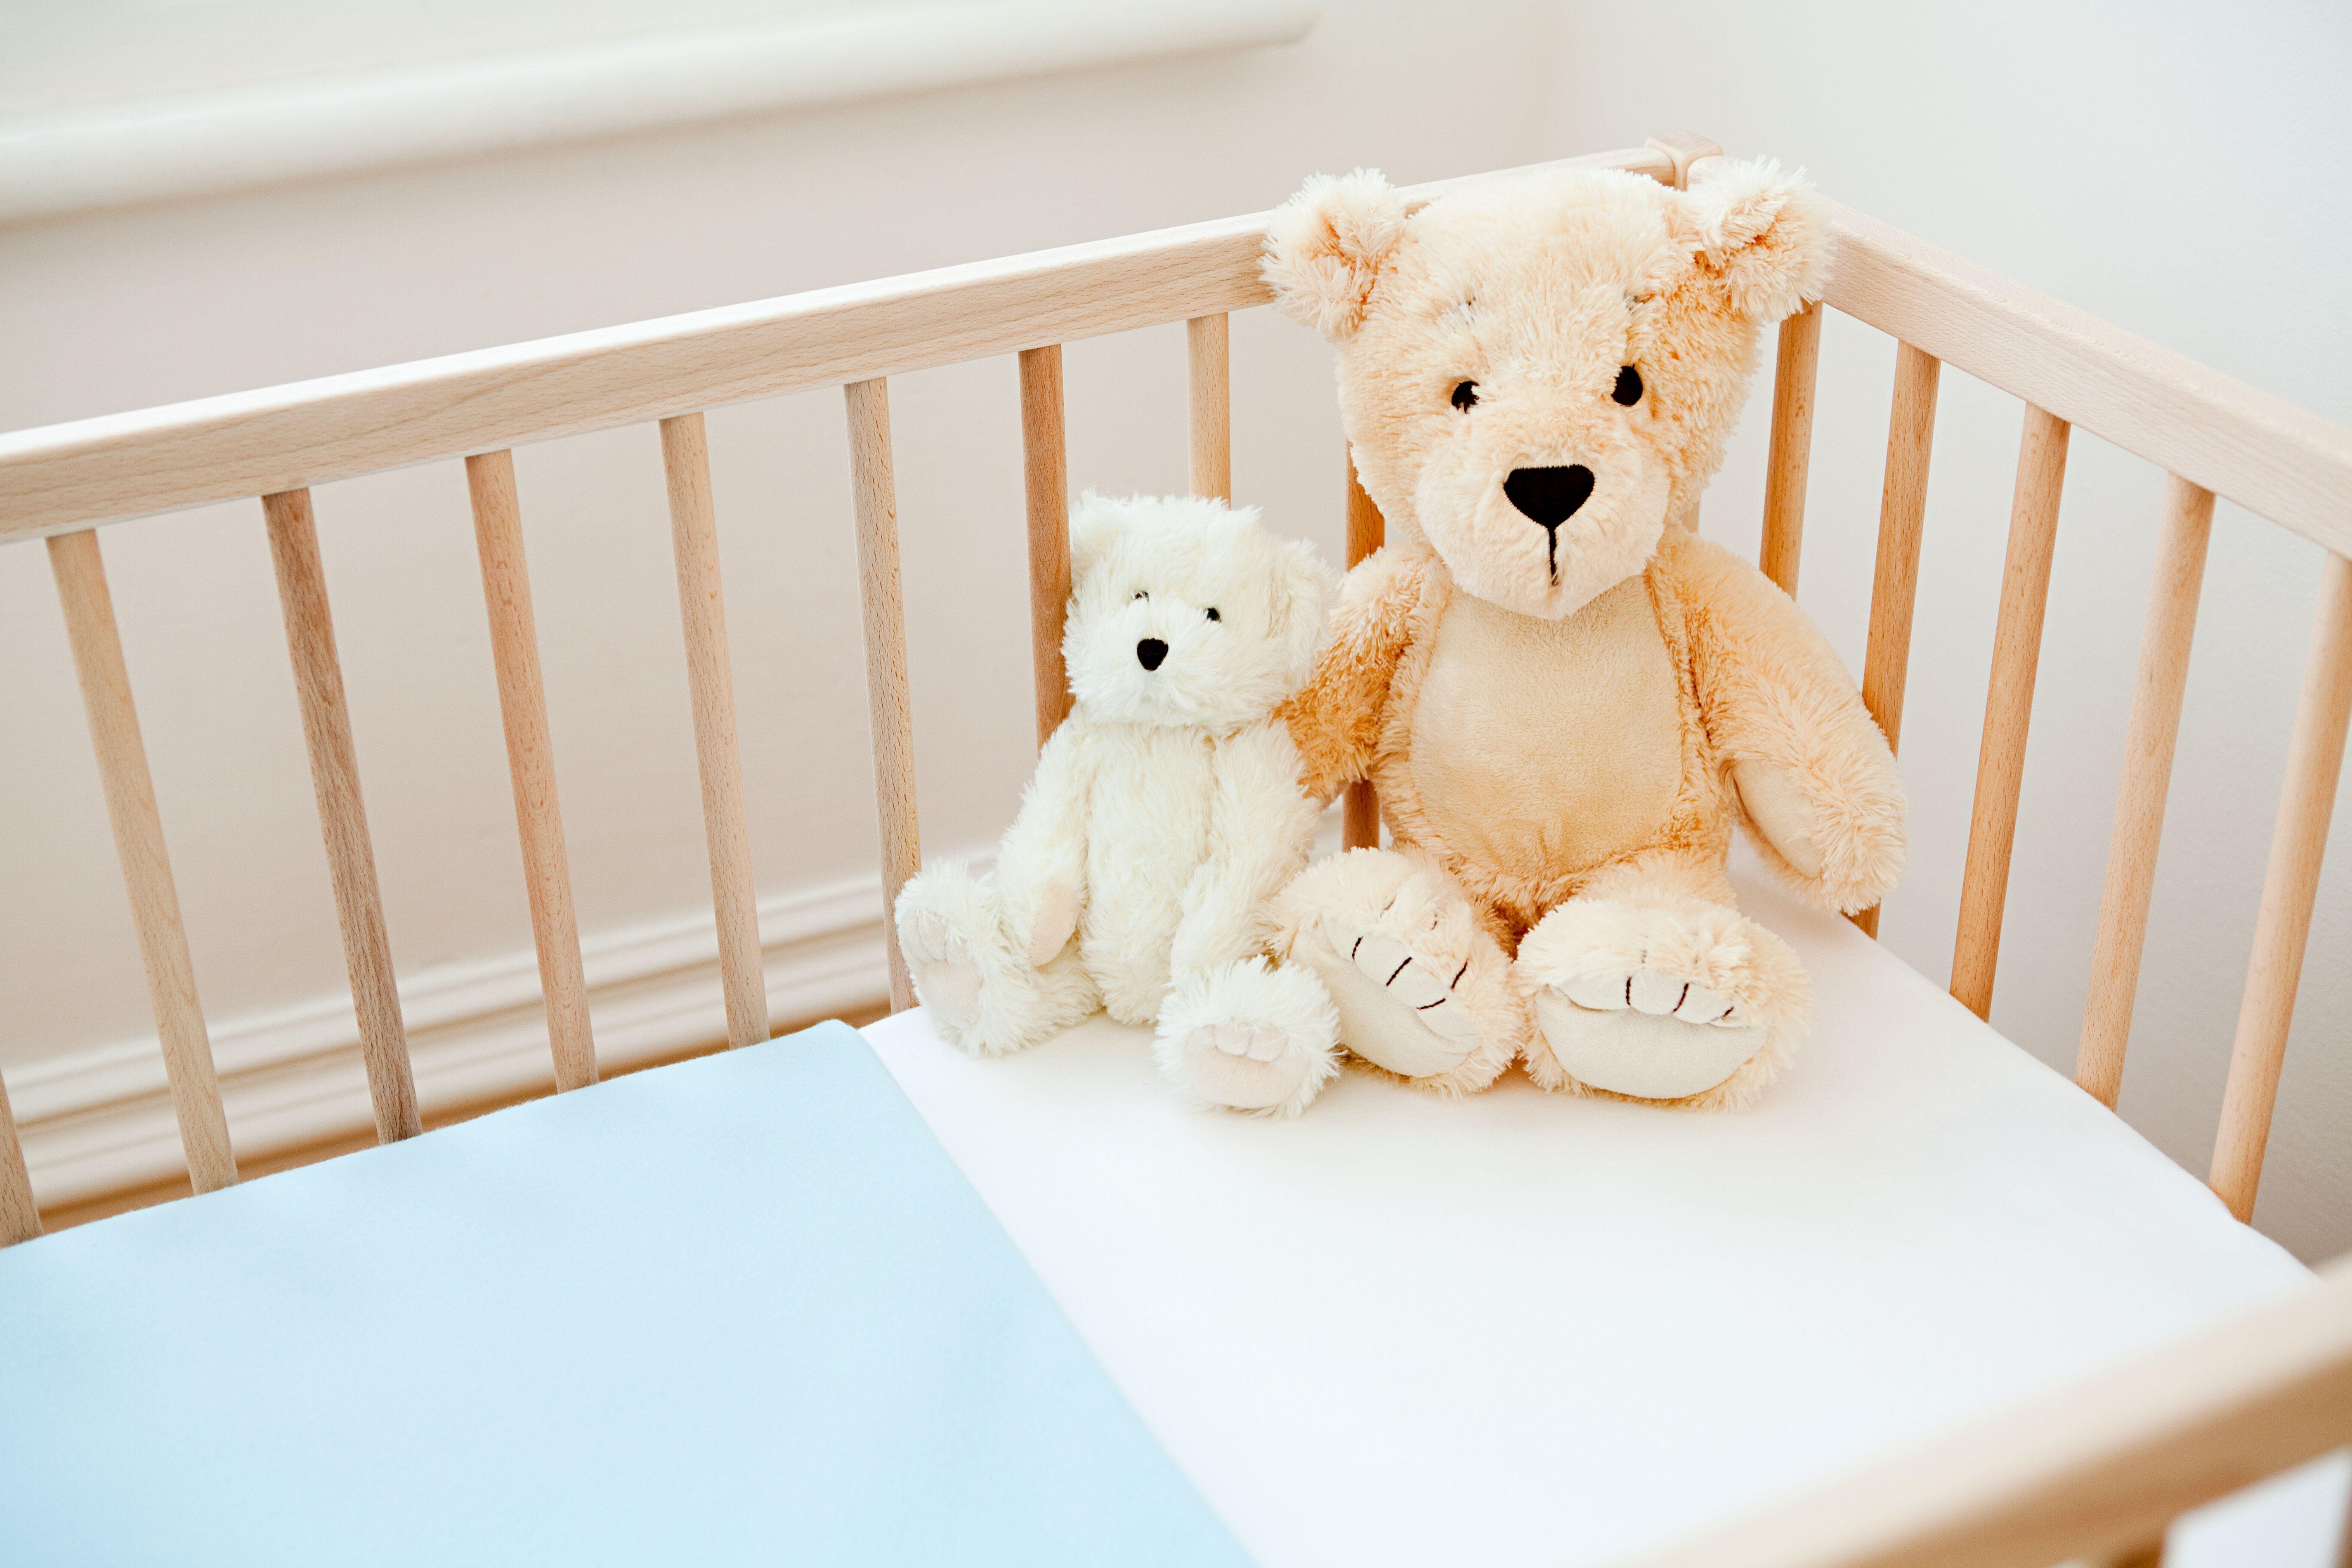 Baby cribs in kenya - Baby Cribs In Kenya 58